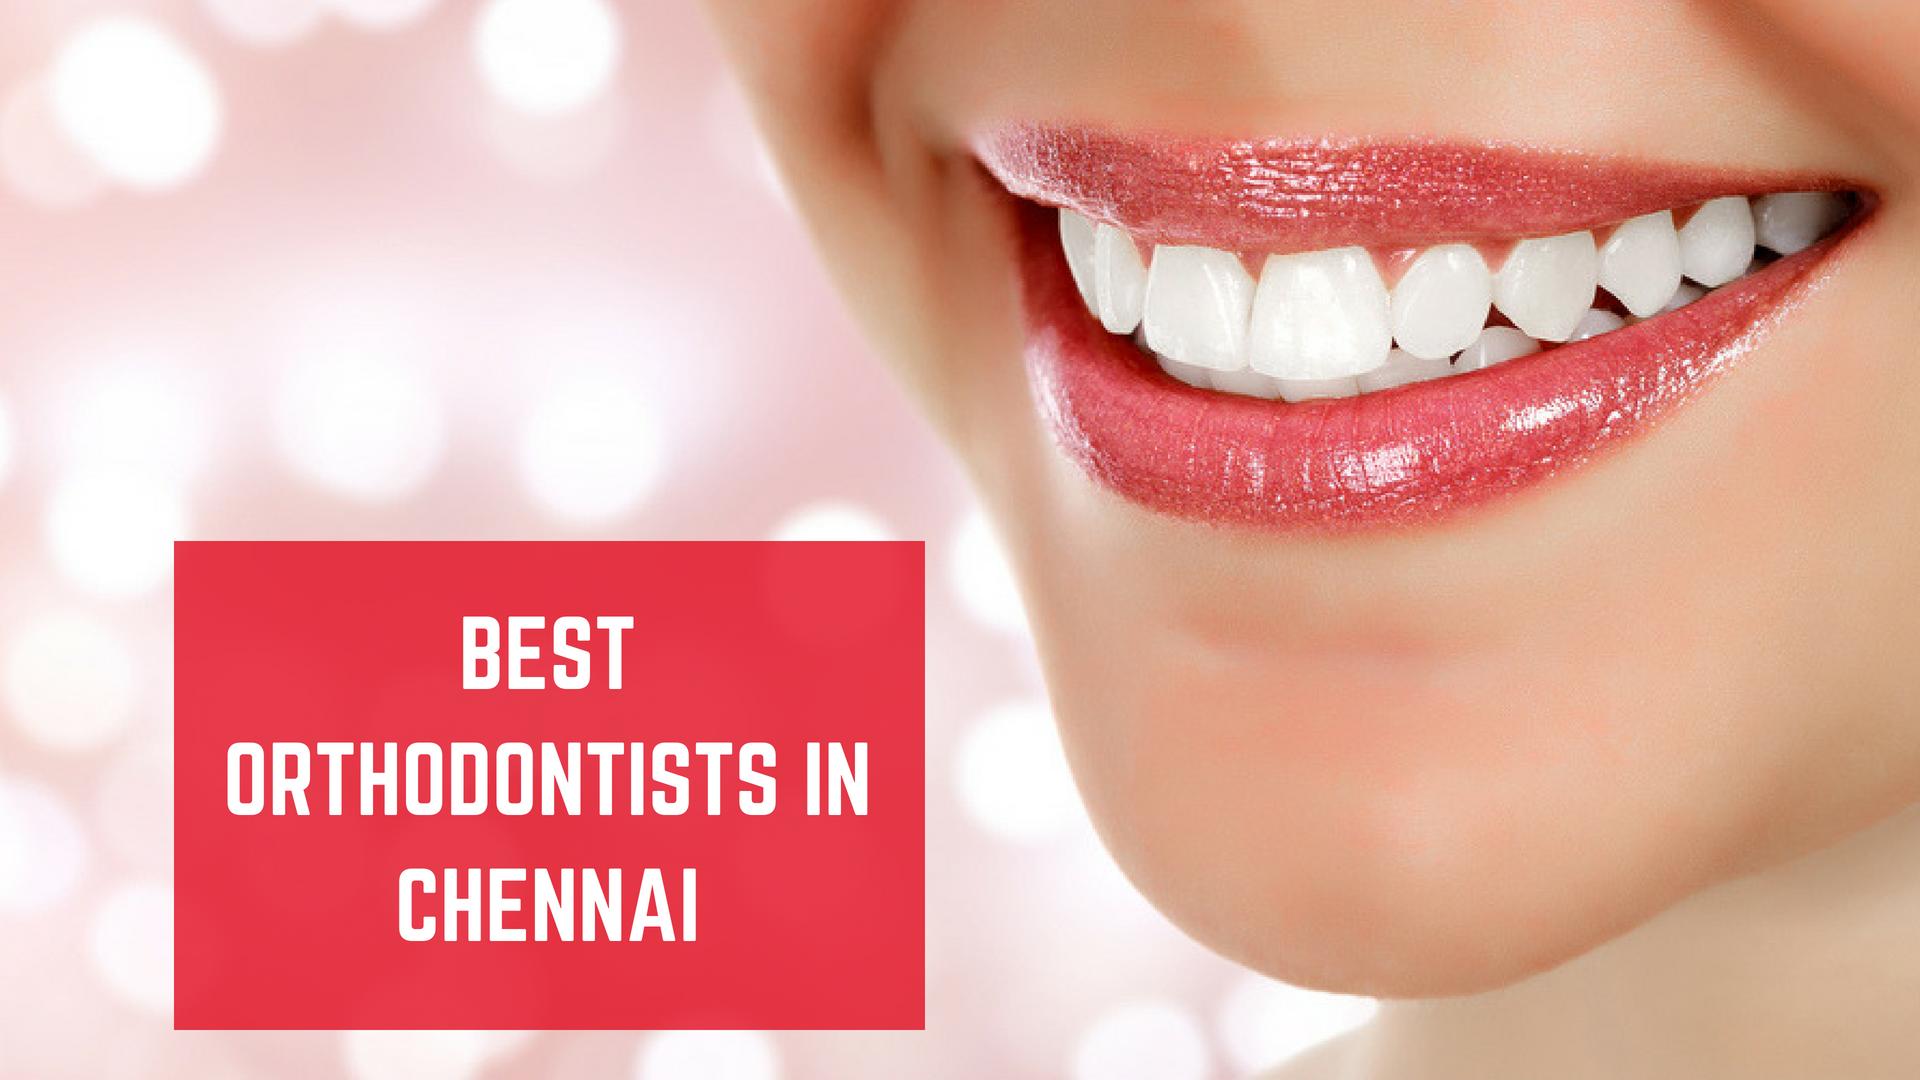 Top 10 Best Orthodontists in Chennai- List 2019 - Essencz